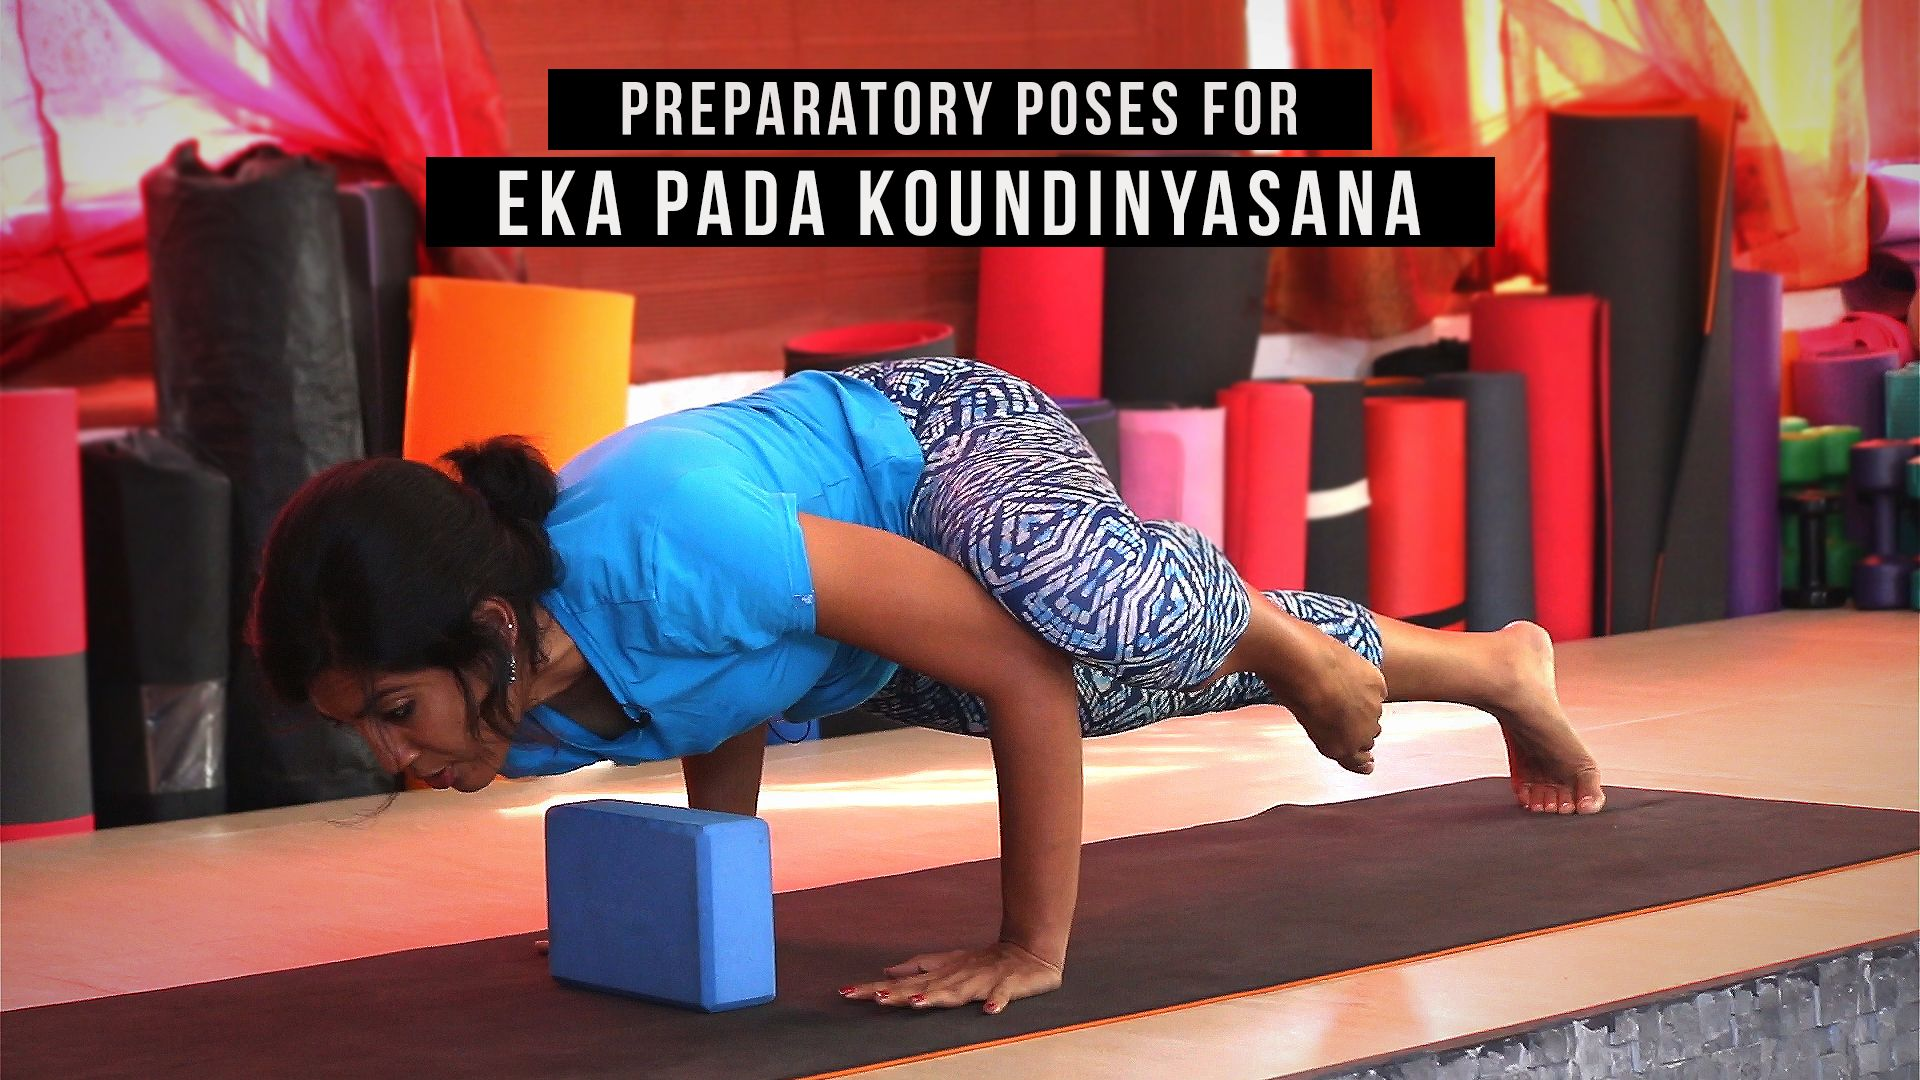 Preparatory Poses For Eka Pada Koundinyasana Ii Poses Yoga Arm Balance Yoga